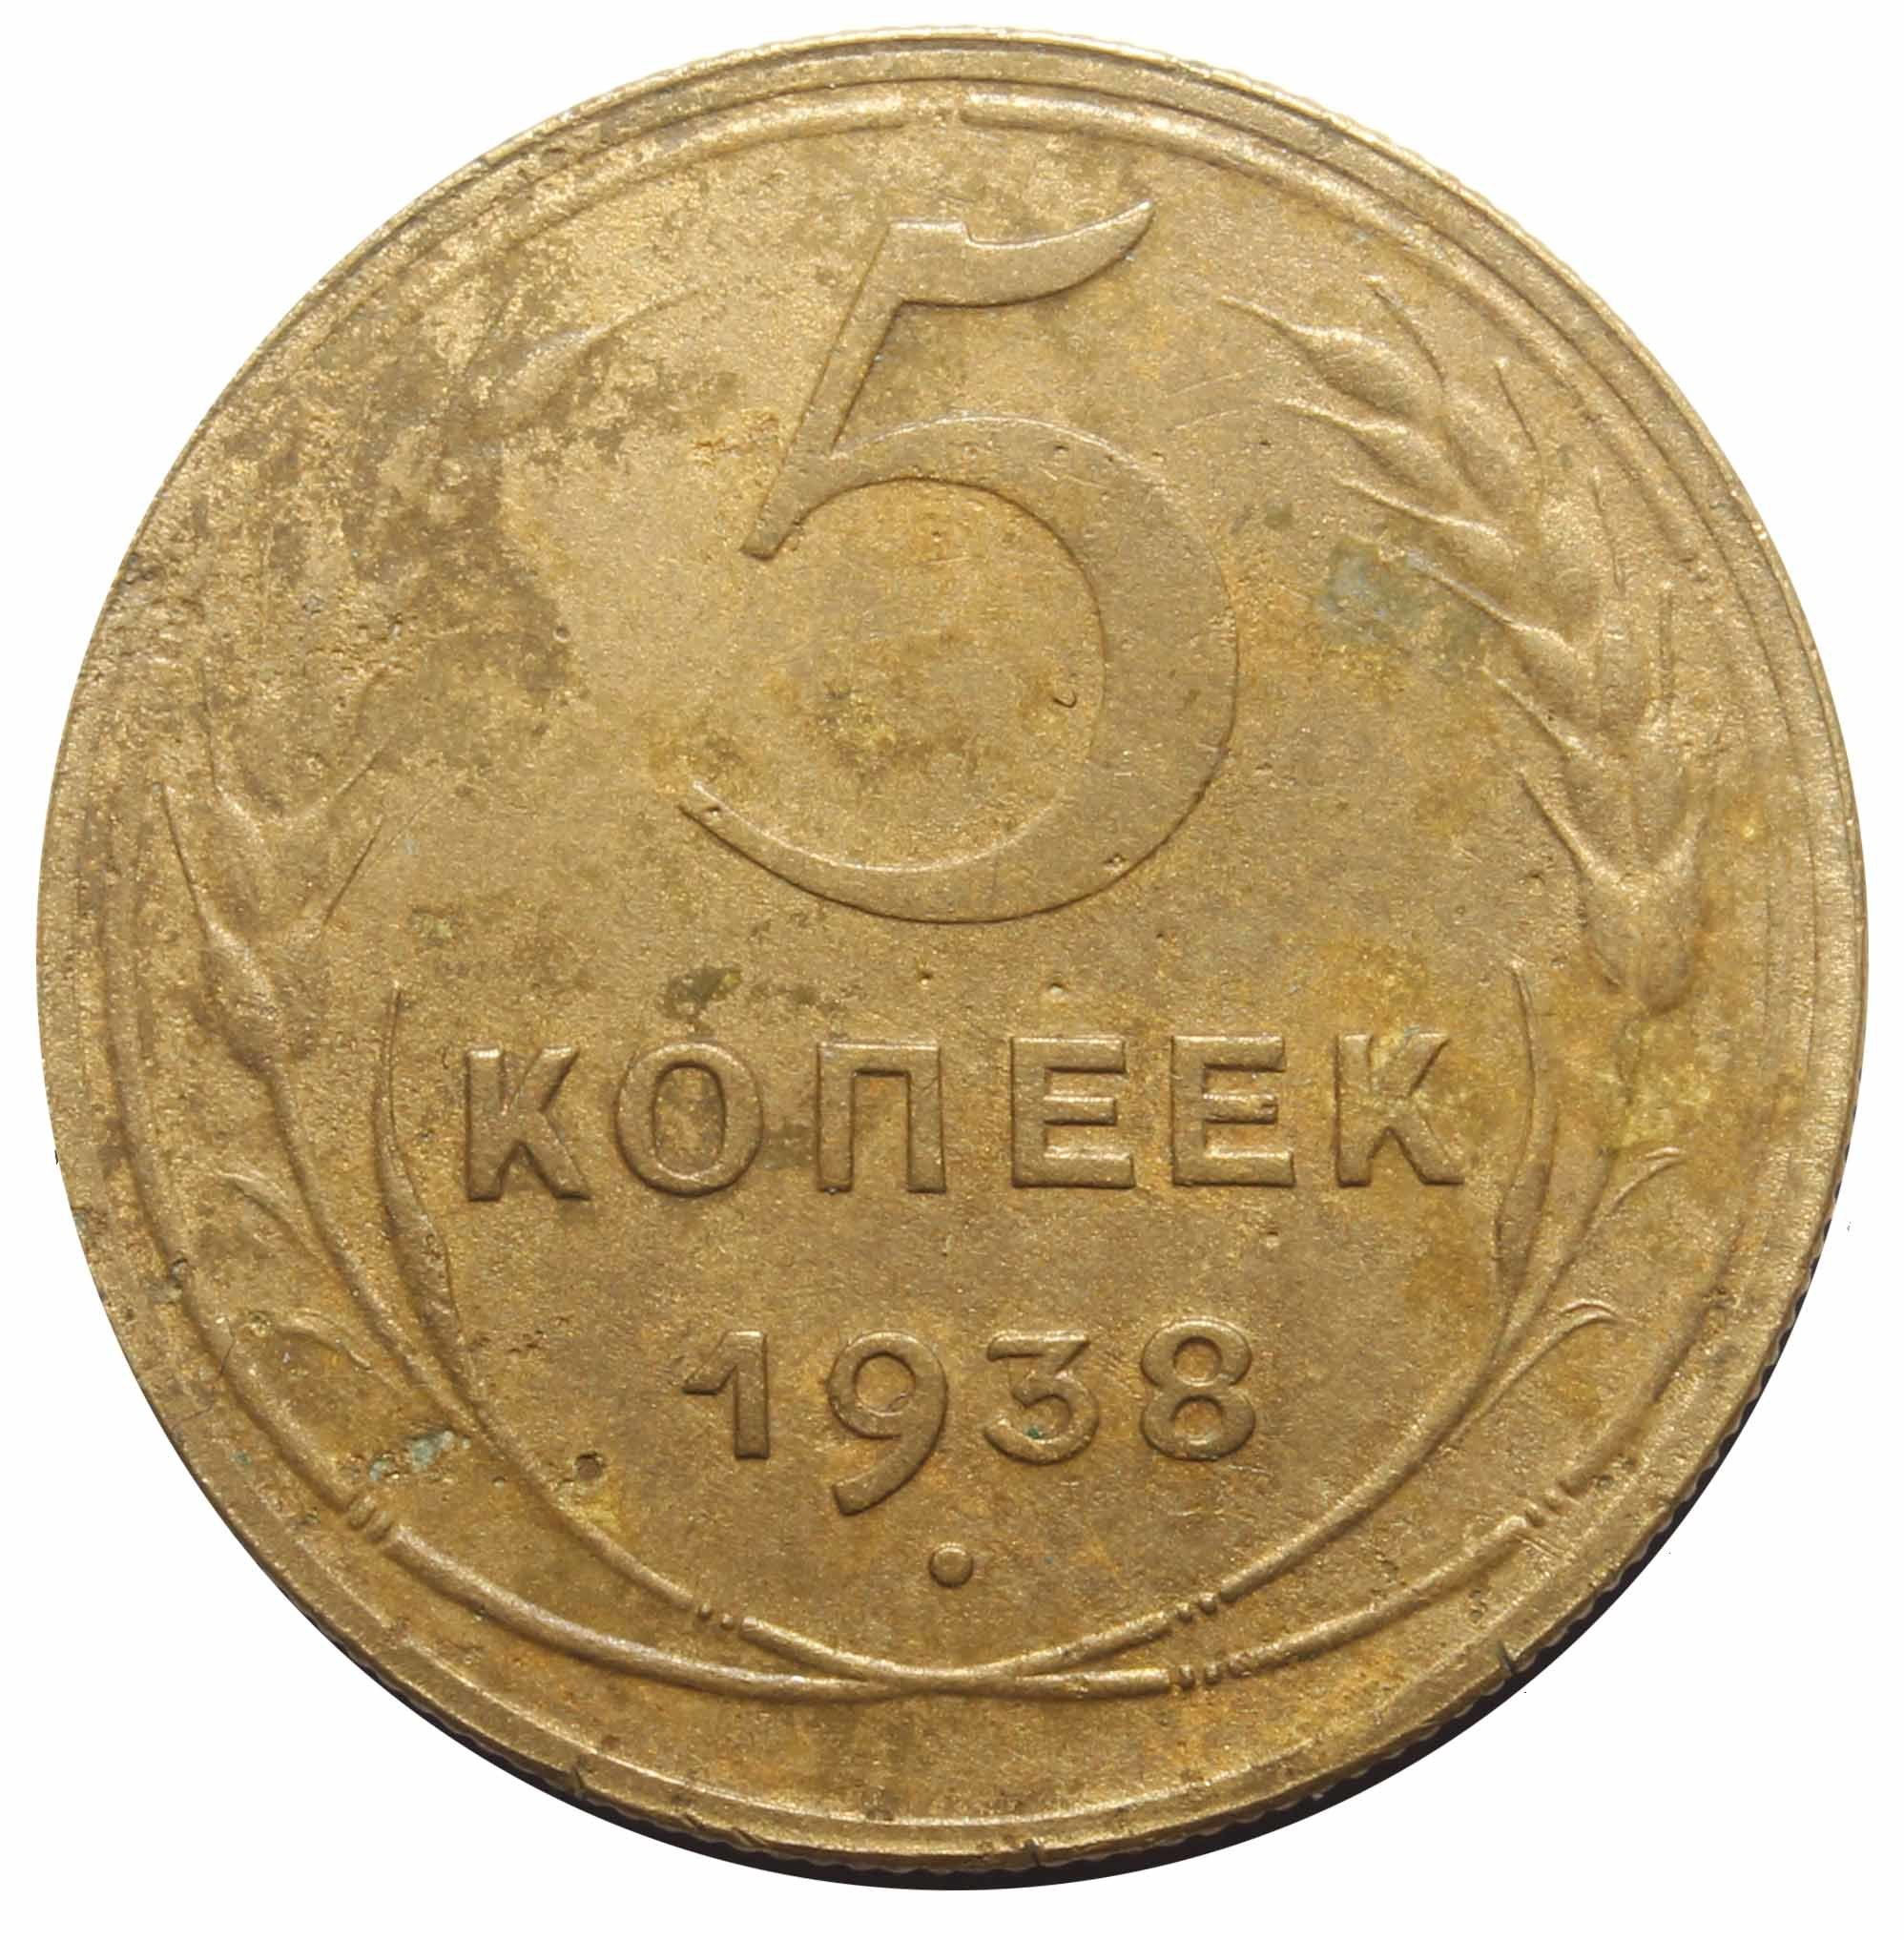 5 копеек 1938 года. (Шт. 1Б) VG